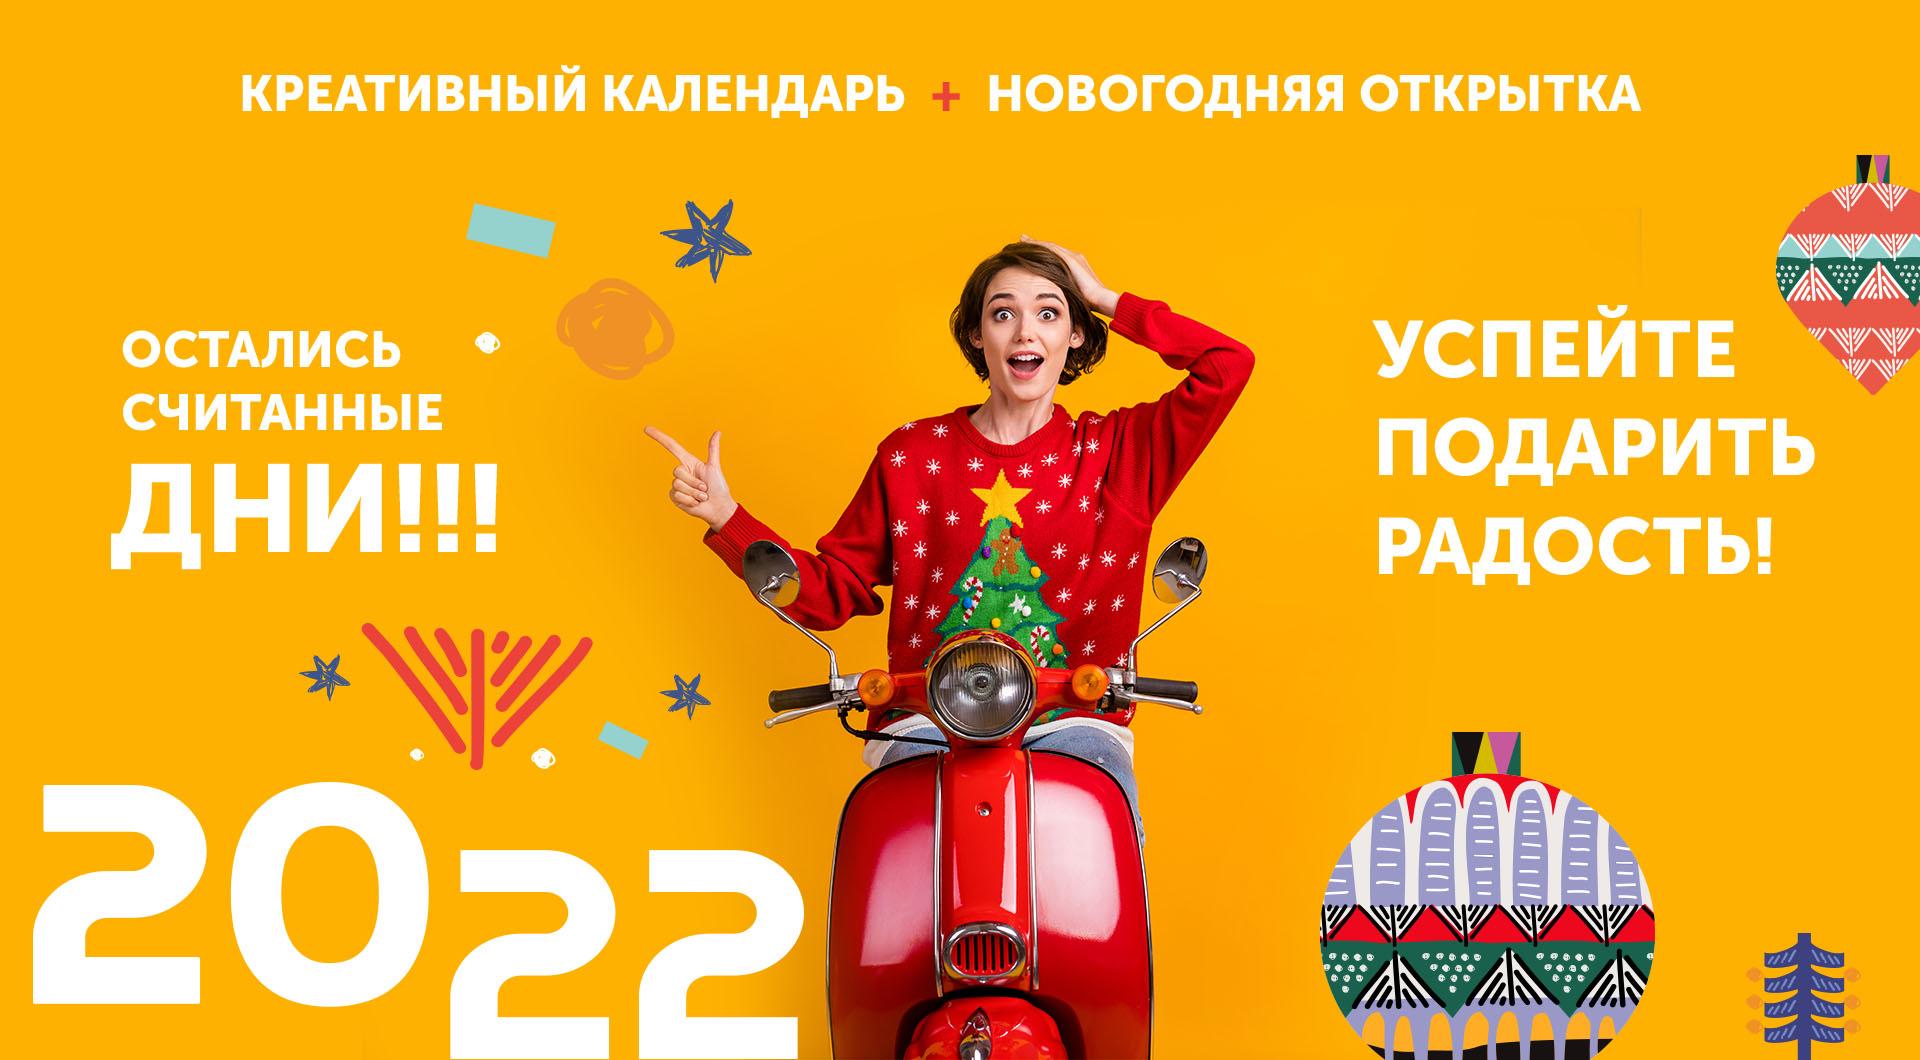 дизайн календаря 2022 год